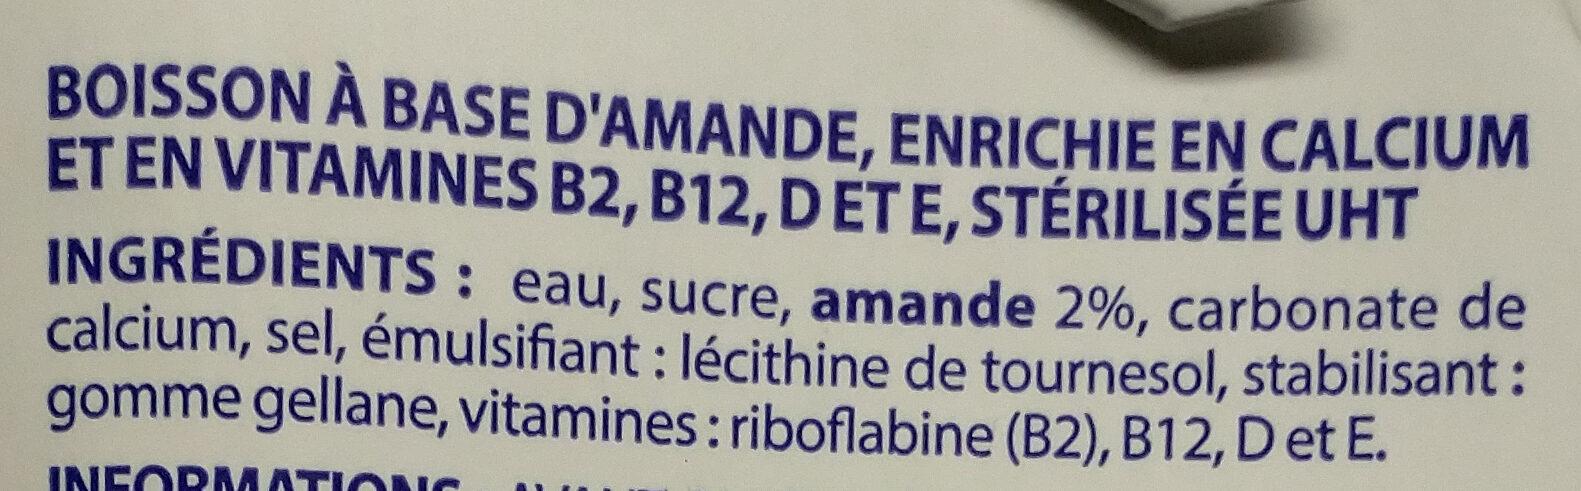 Boisson amande calcium - Ingrédients - fr